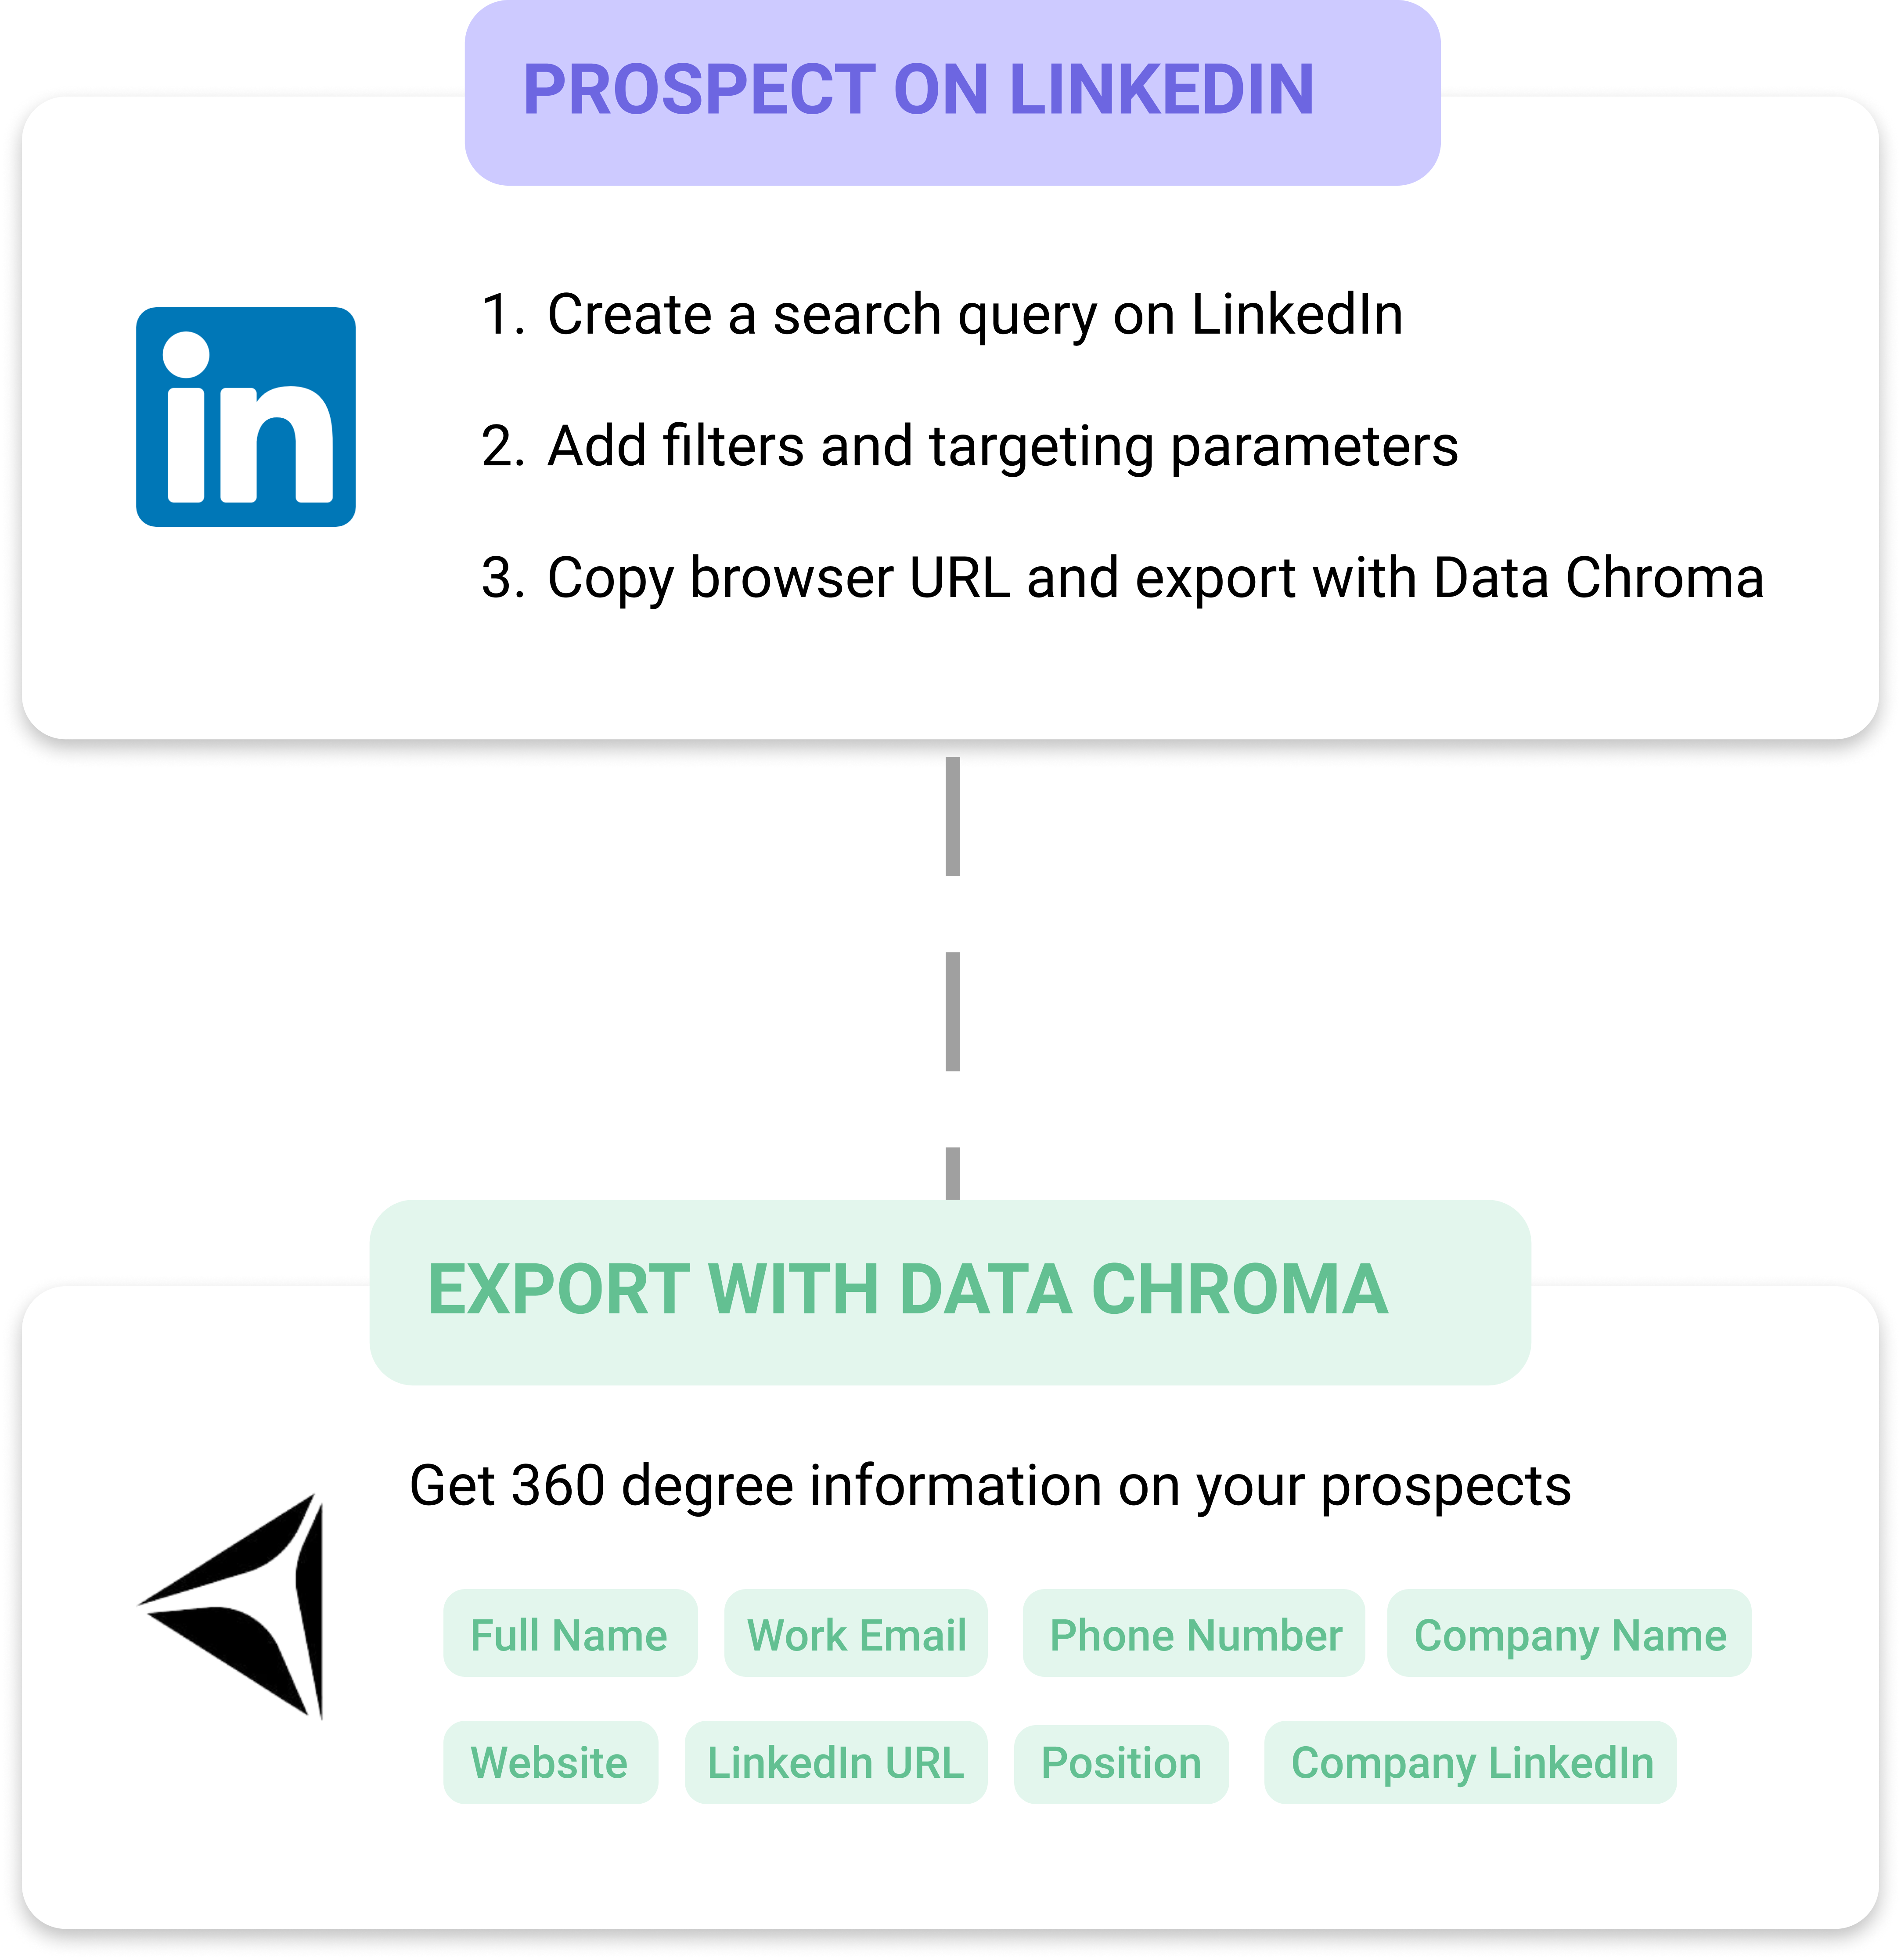 B2B Prospecting with LinkedIn